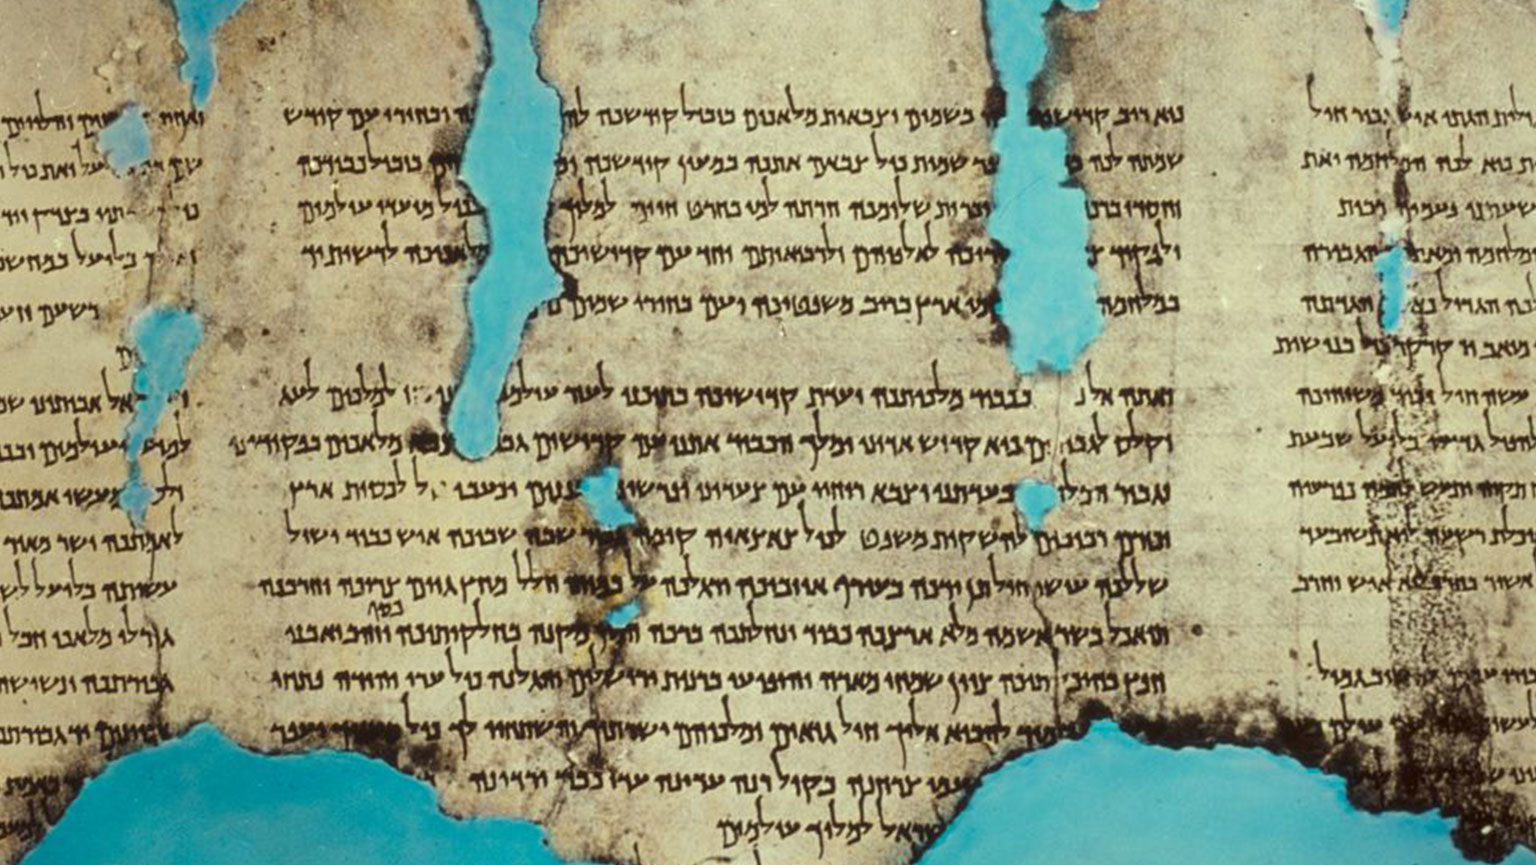 Apocrypha and Dead Sea Scrolls